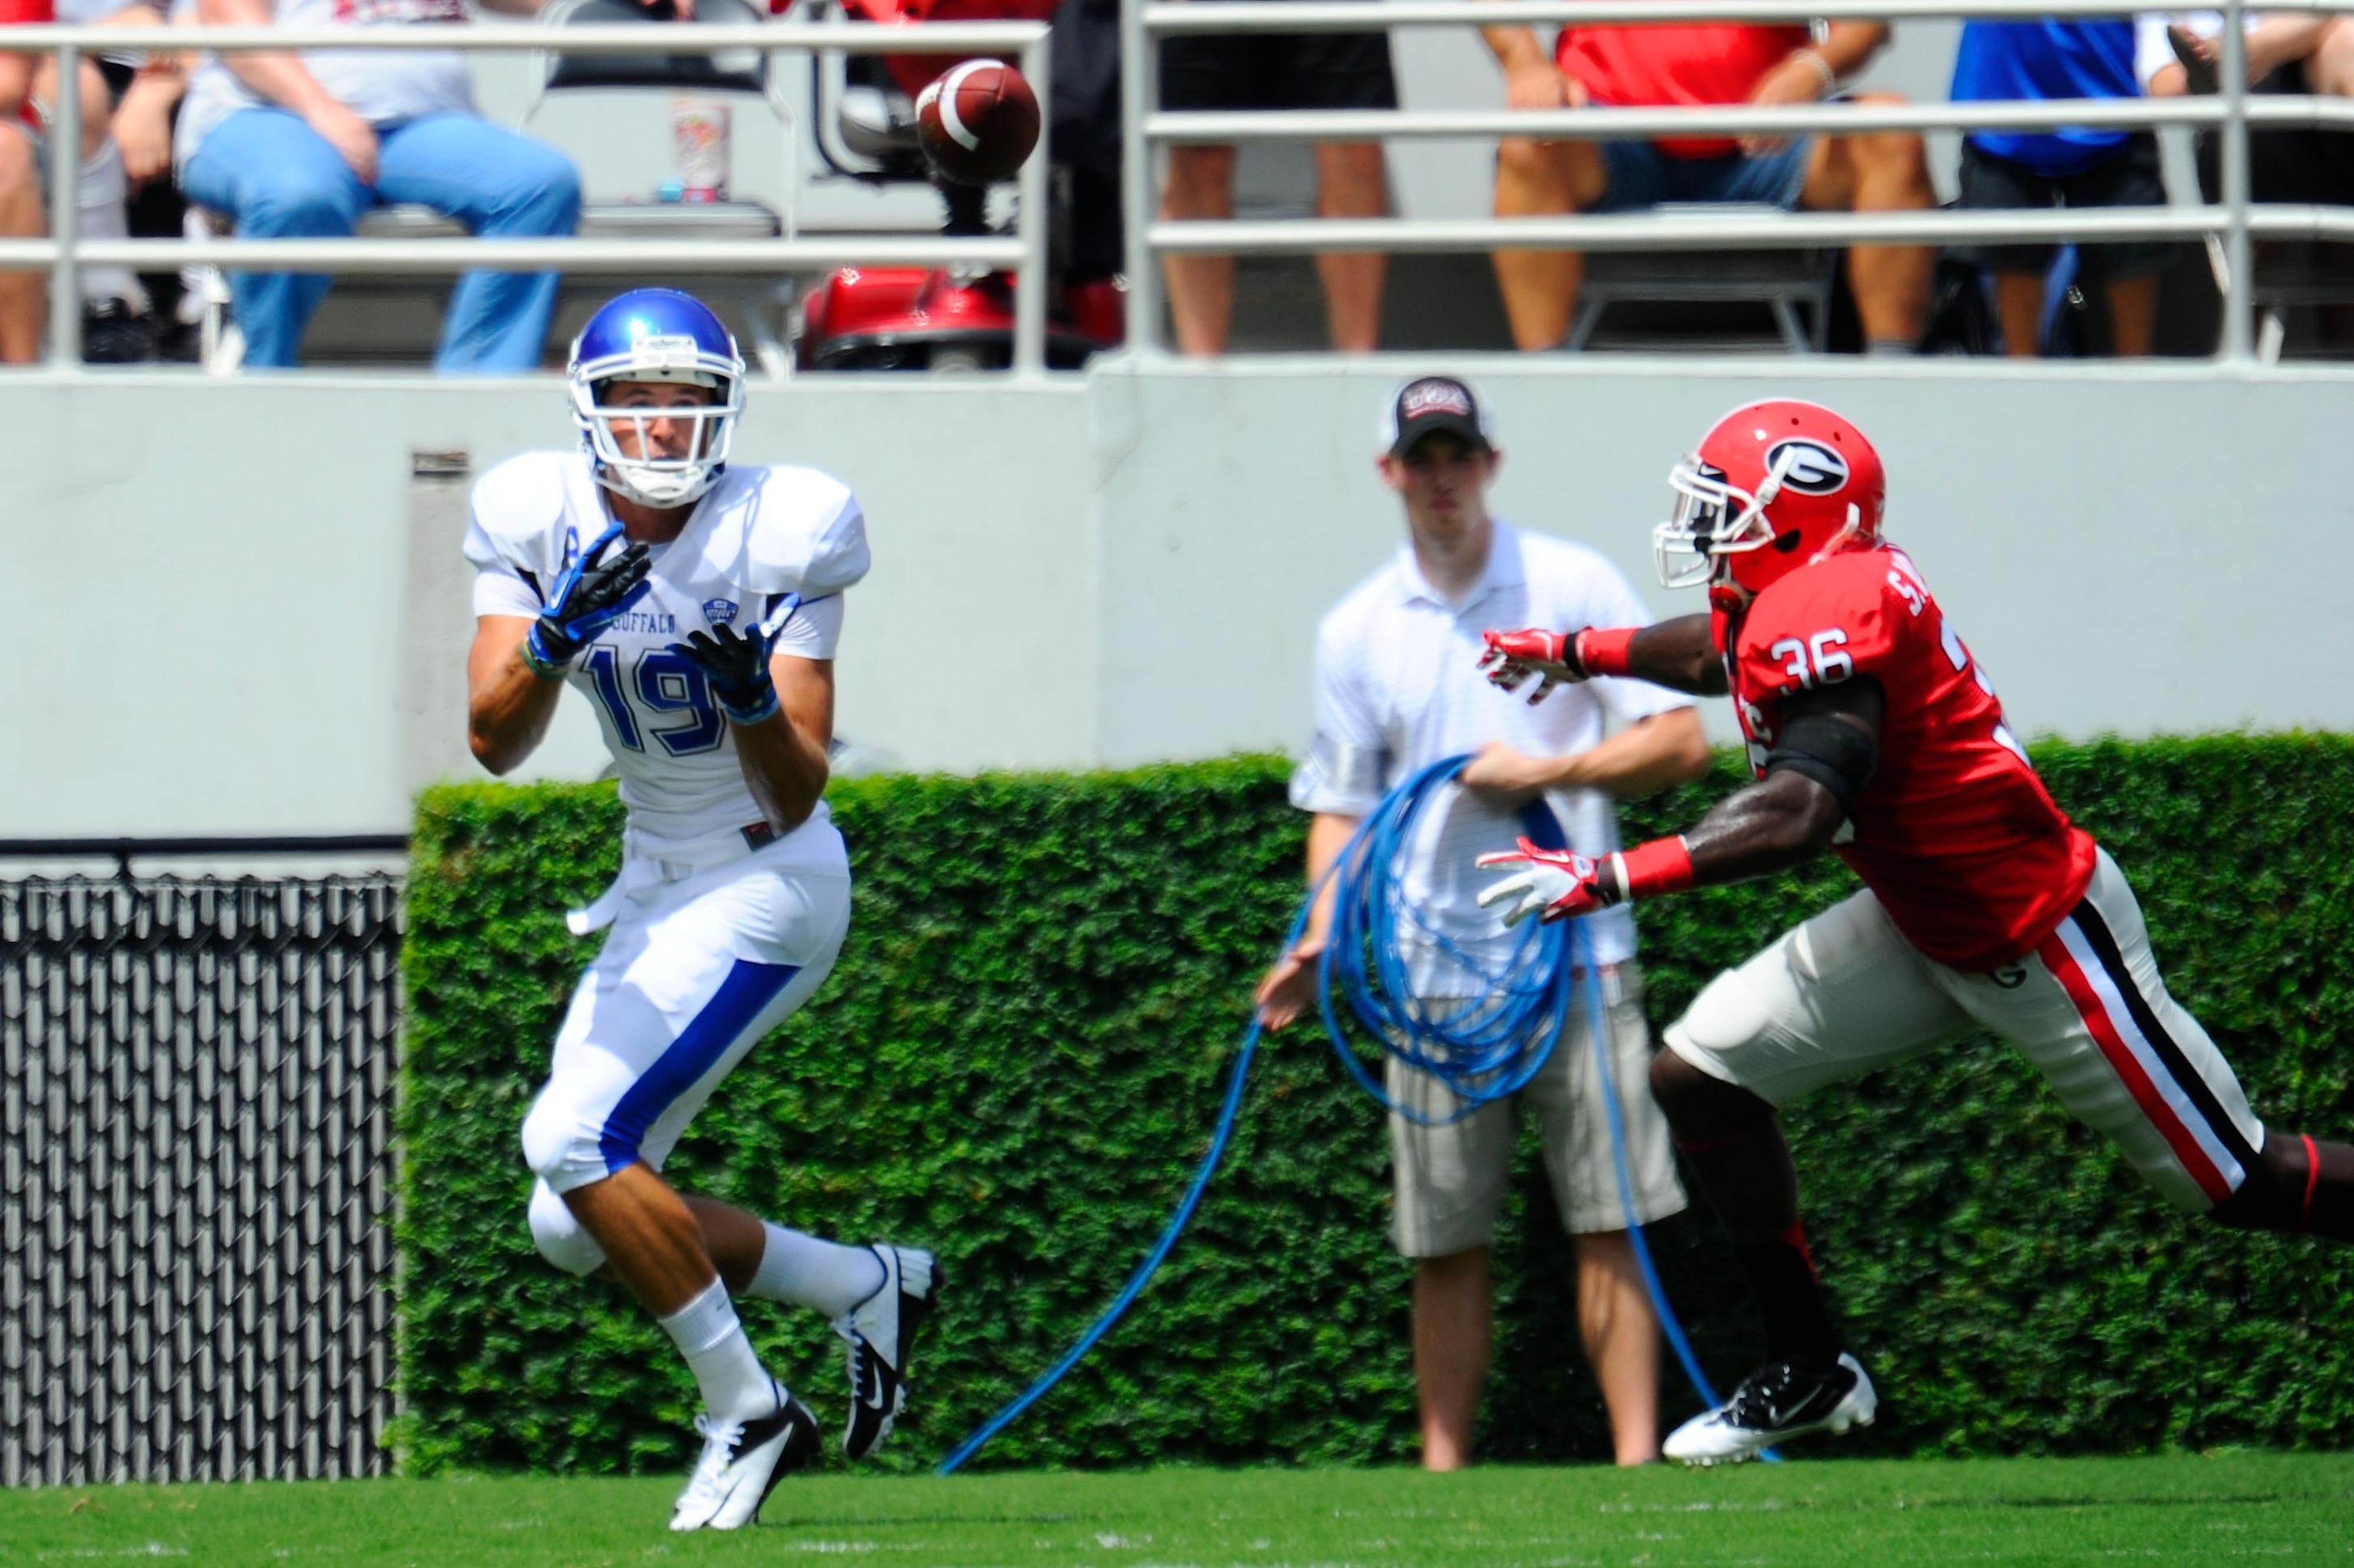 I plan on catching many touchdowns this week!    Mandatory Credit: Dale Zanine-US PRESSWIRE